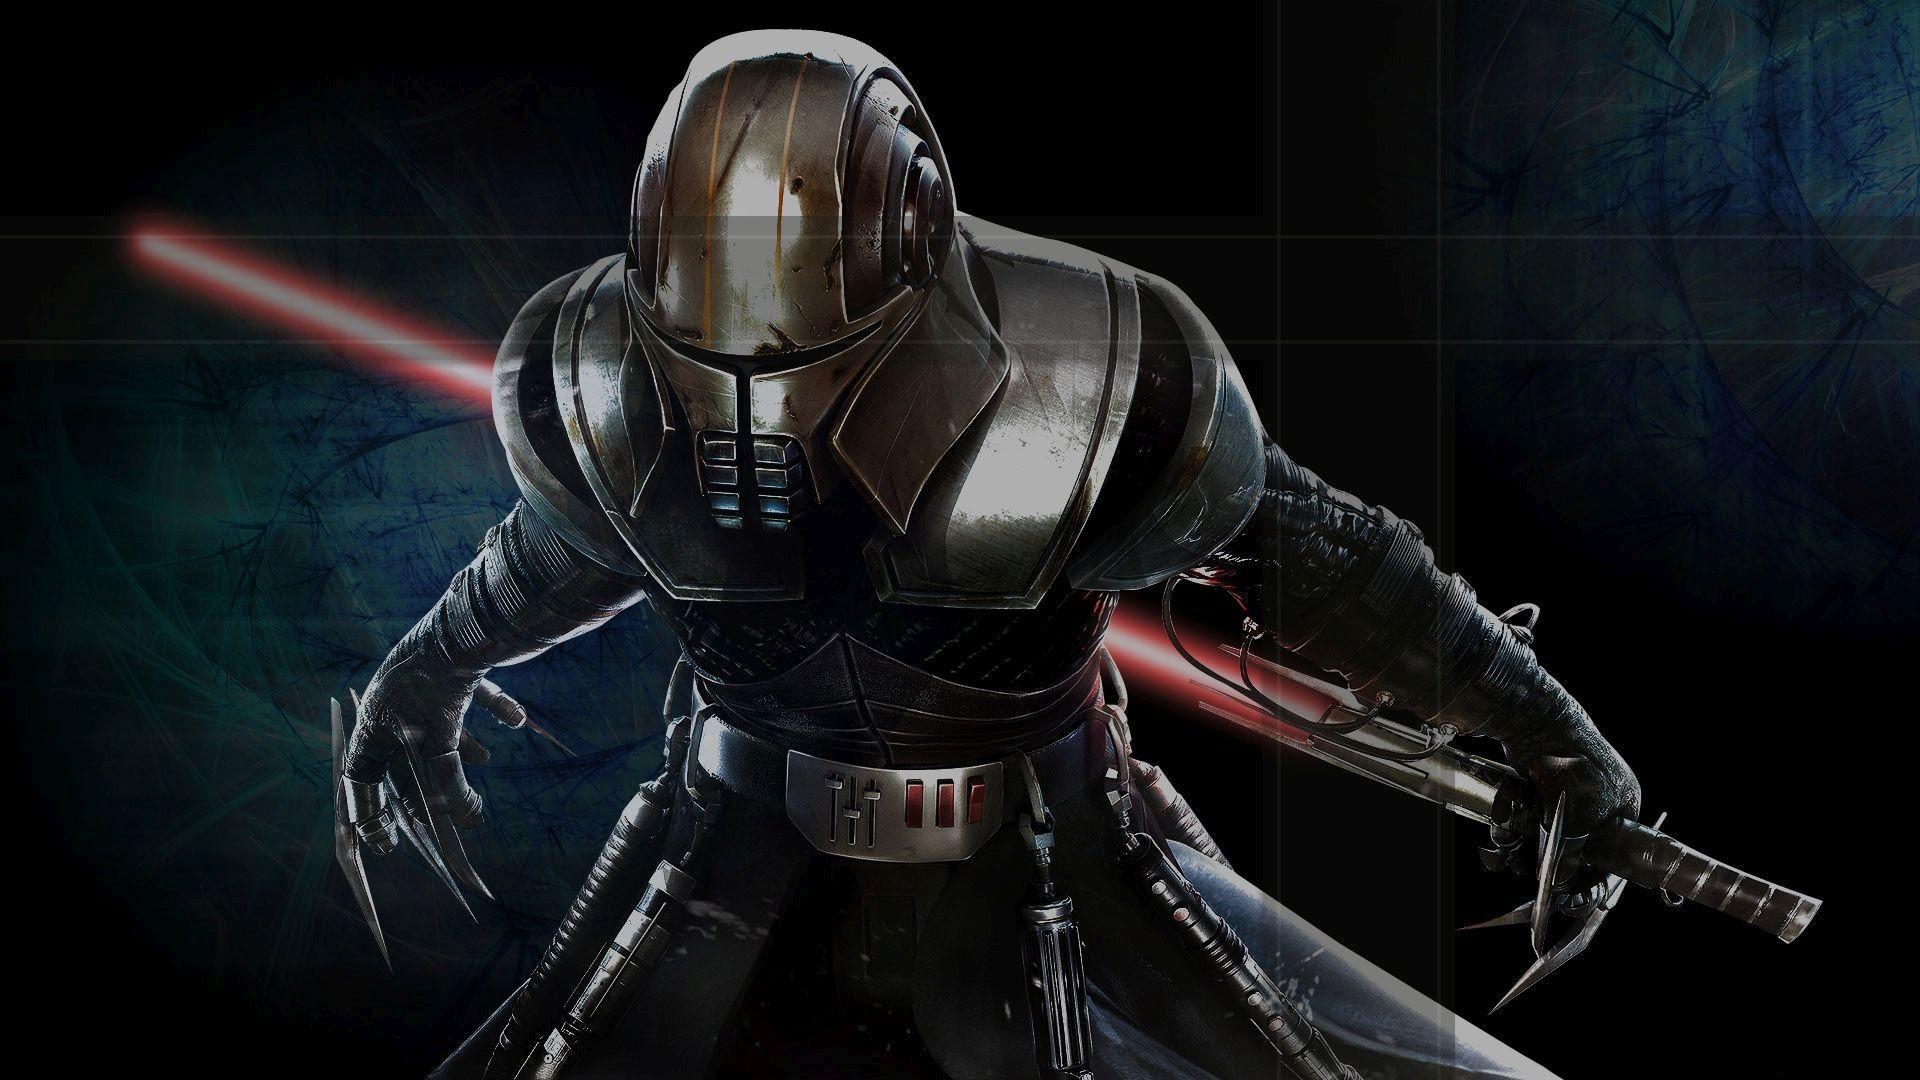 Millenium Falcon from Star Wars Widescreen Wallpaper – #20702